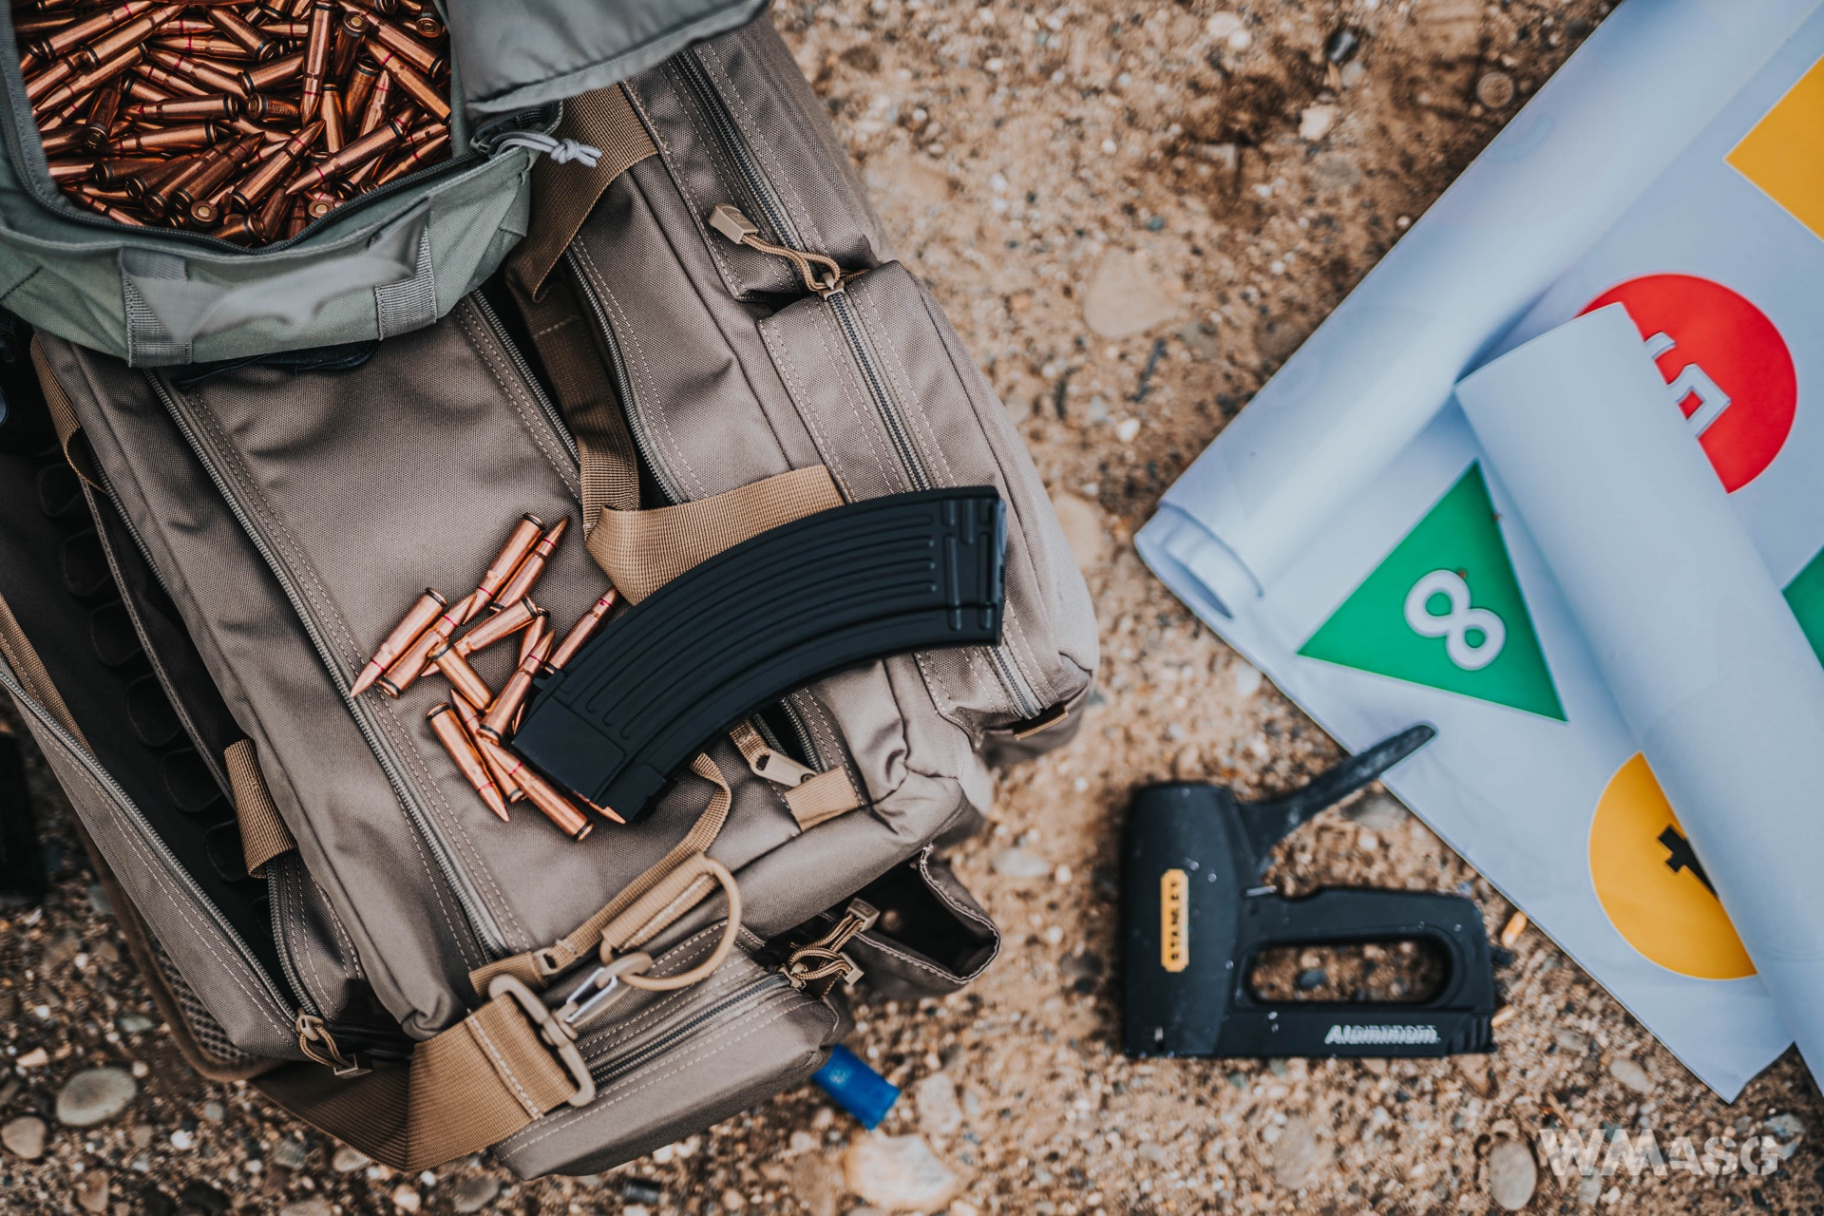 Krok po kroku do uzyskania pozwolenia na broń